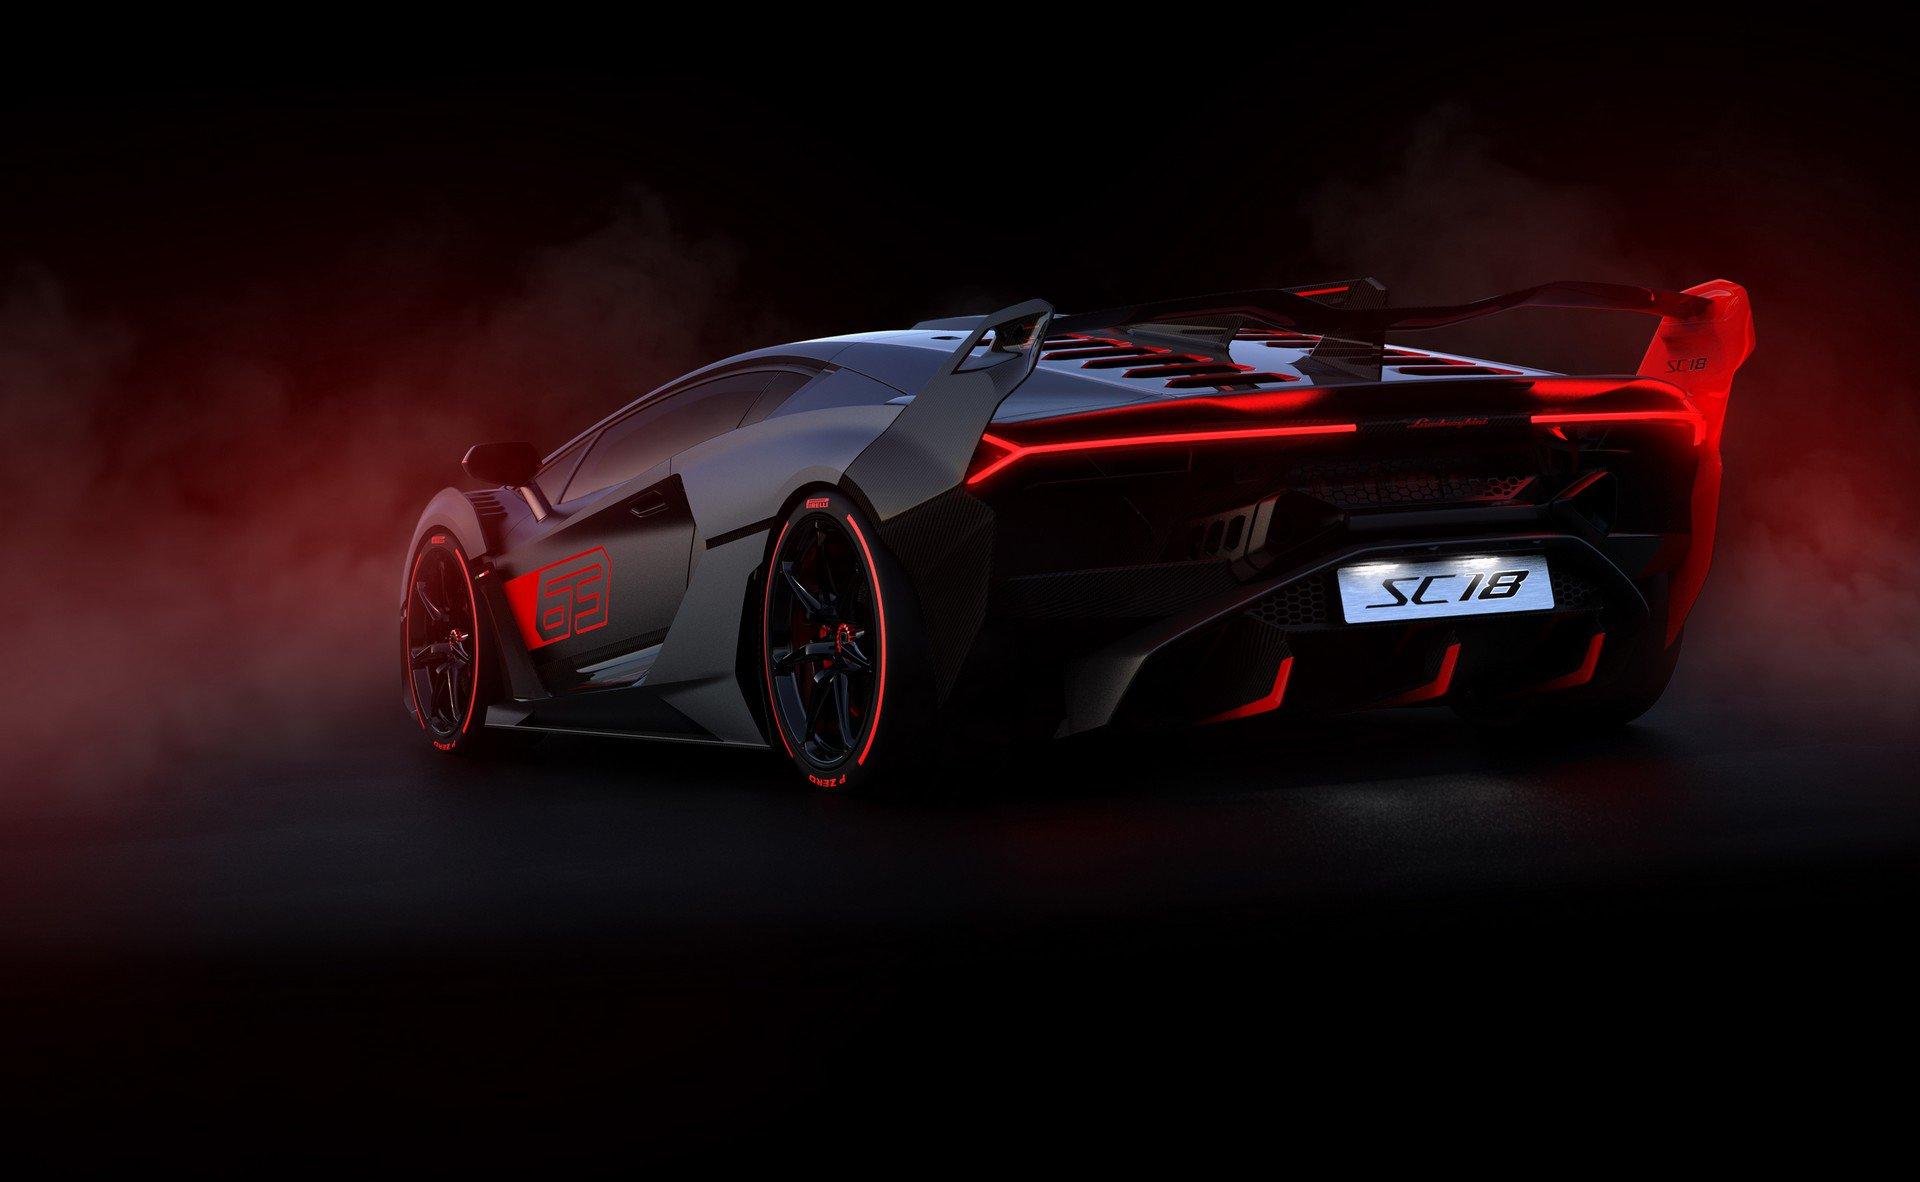 Lamborghini SC18 taillights